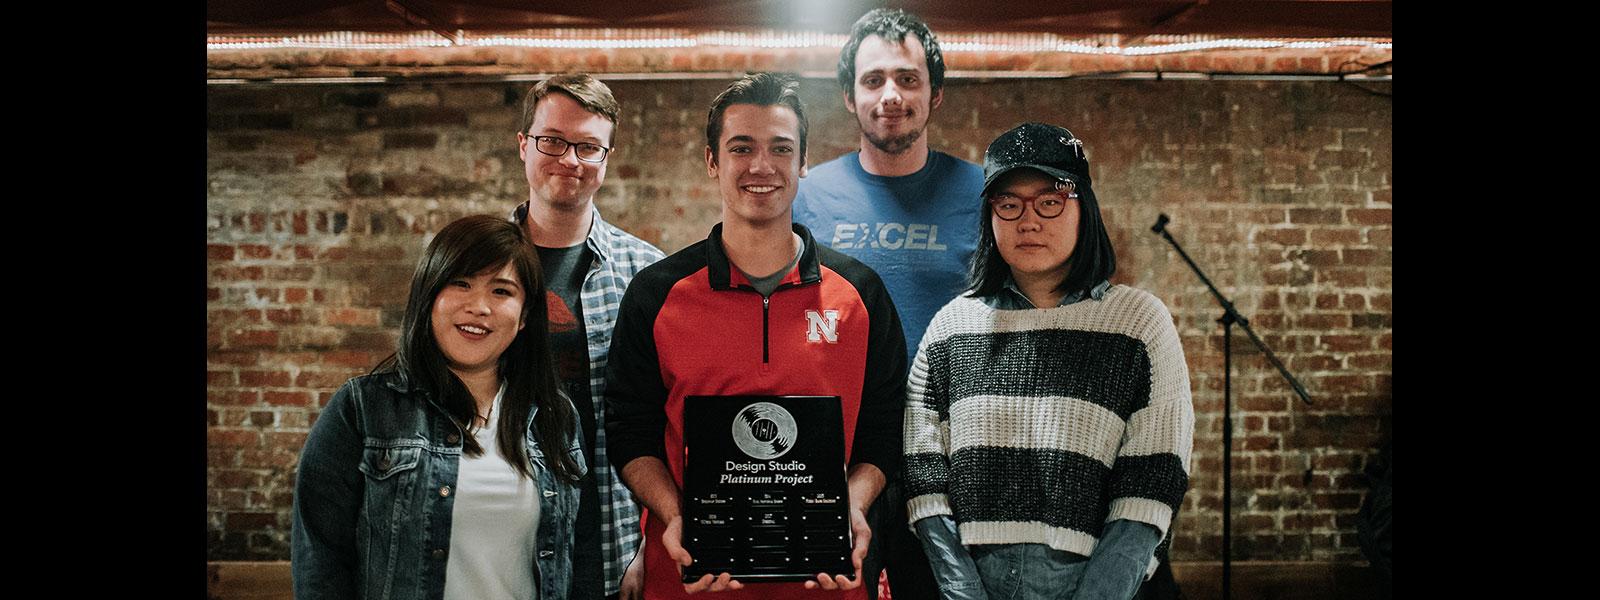 Photo of the Platinum Award Winning Computer Engineering Senior Design Team.